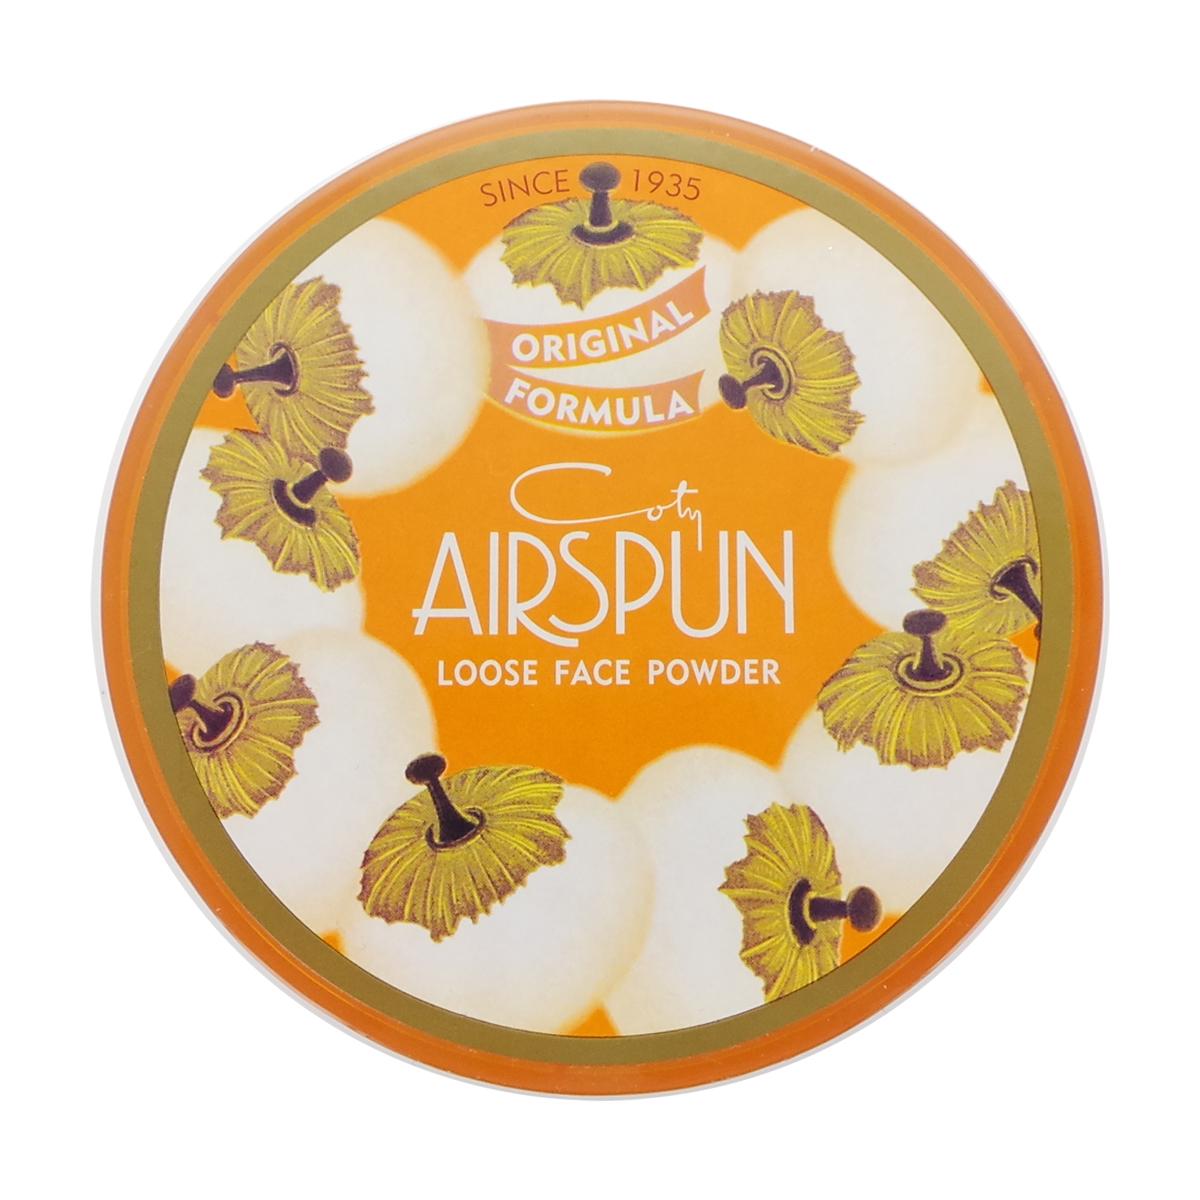 COTY Airspun Loose Face Powder - Honey Beige (12 Pack) - image 1 of 1